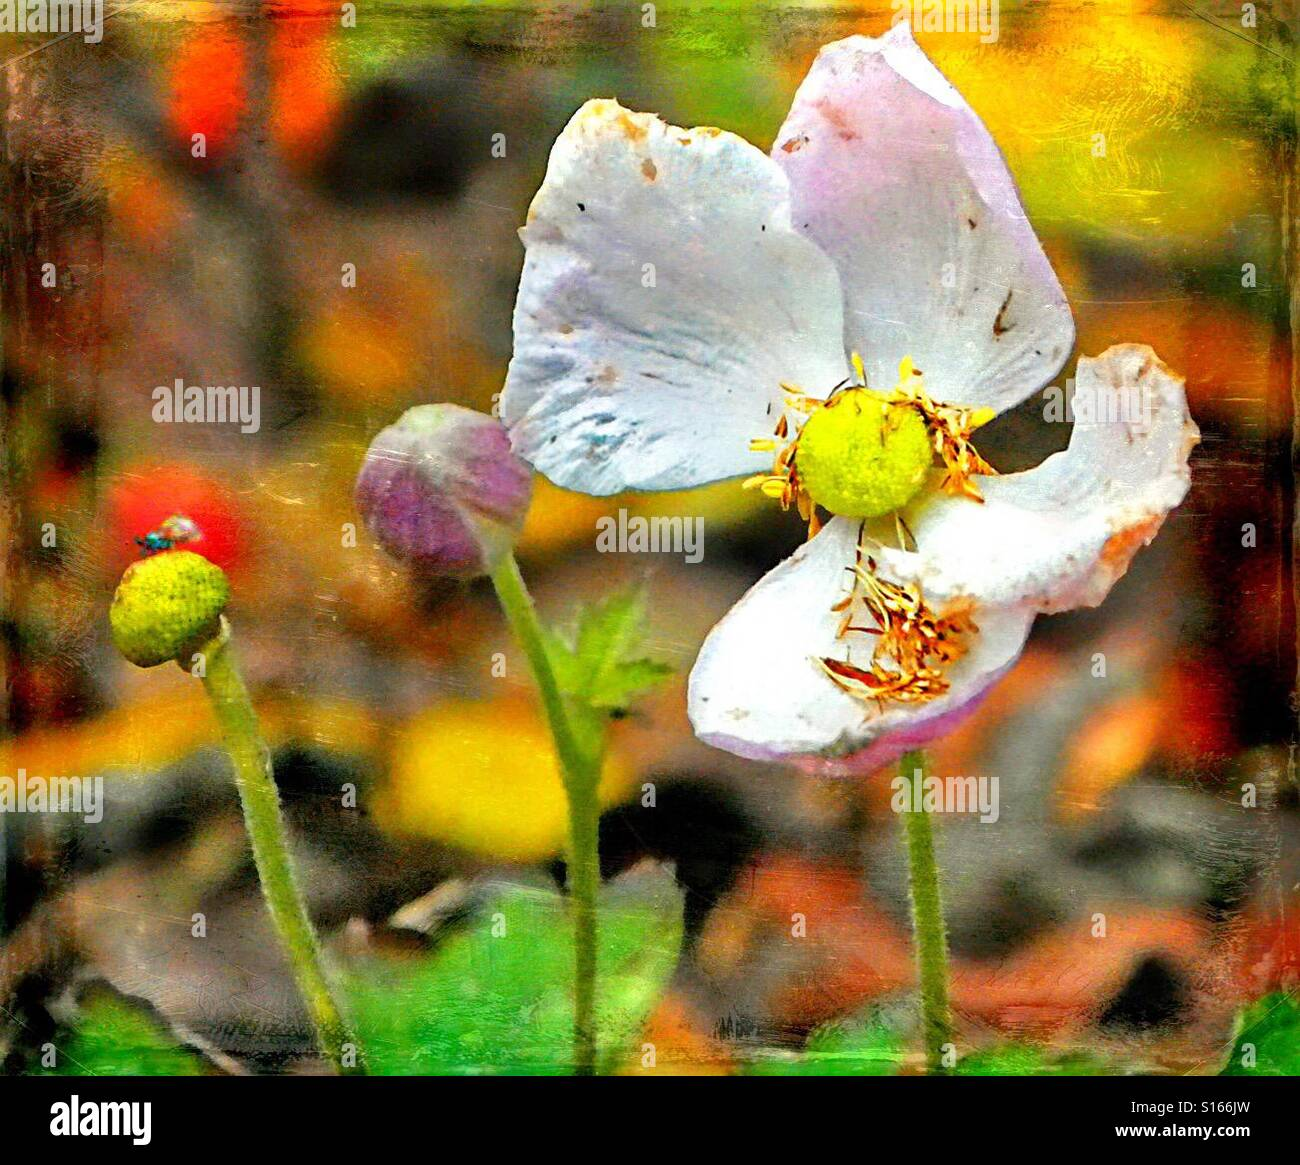 Herbst Anemone Verliert Blatter Stockfoto Bild 310538225 Alamy